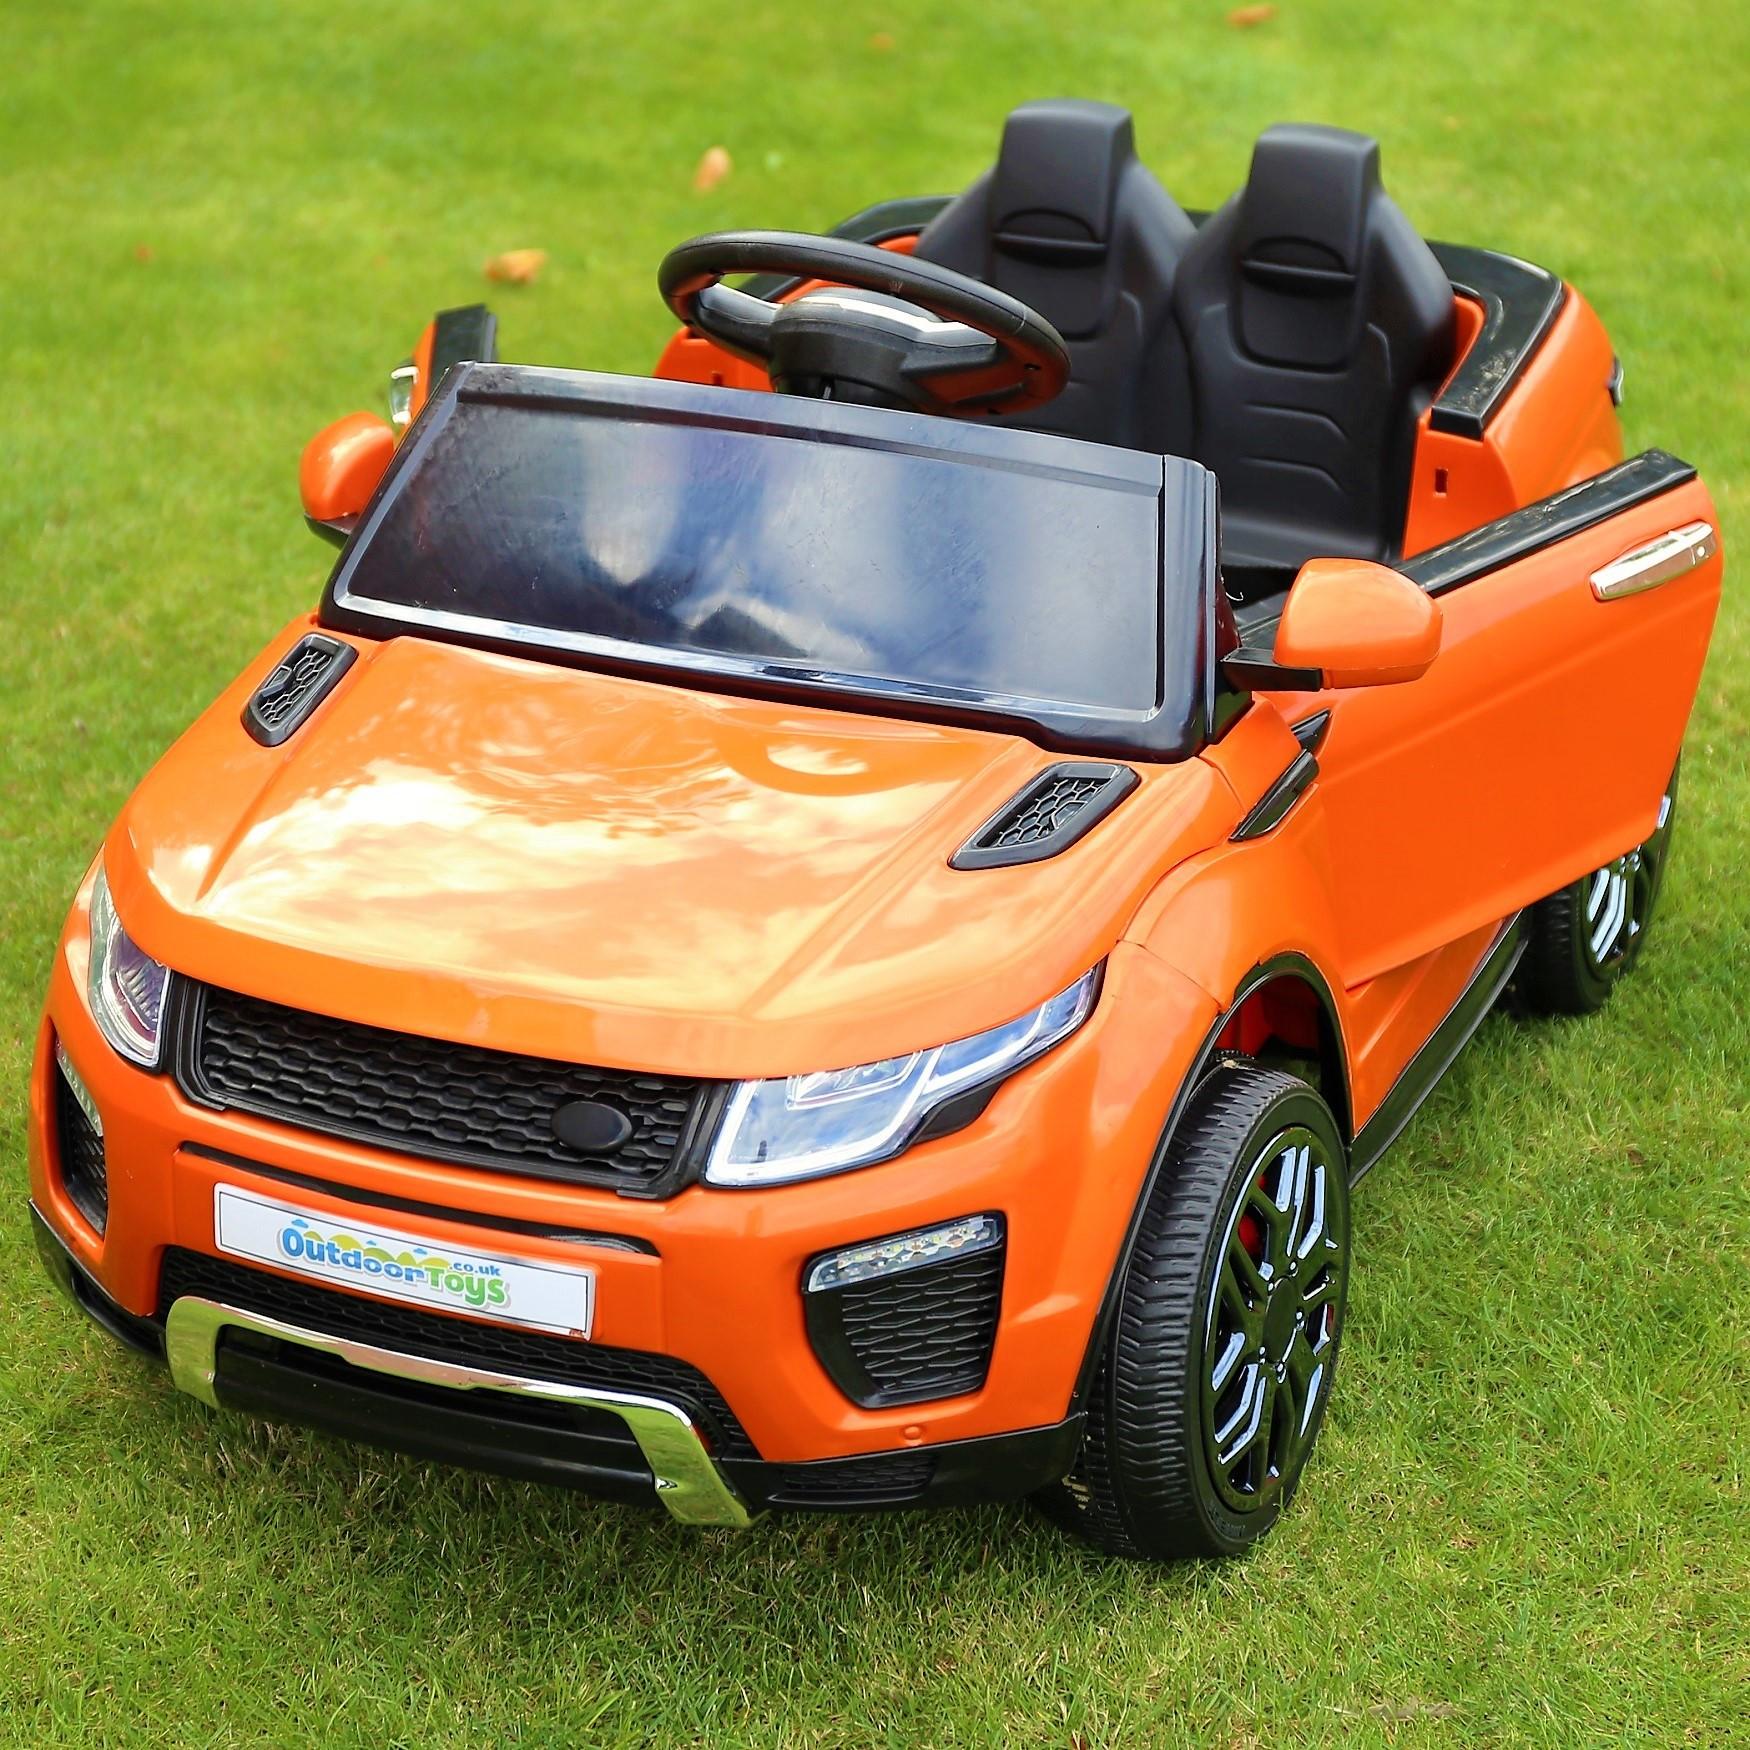 Range Rover Evoque Style 12v Child s Electric Ride Car Jeep